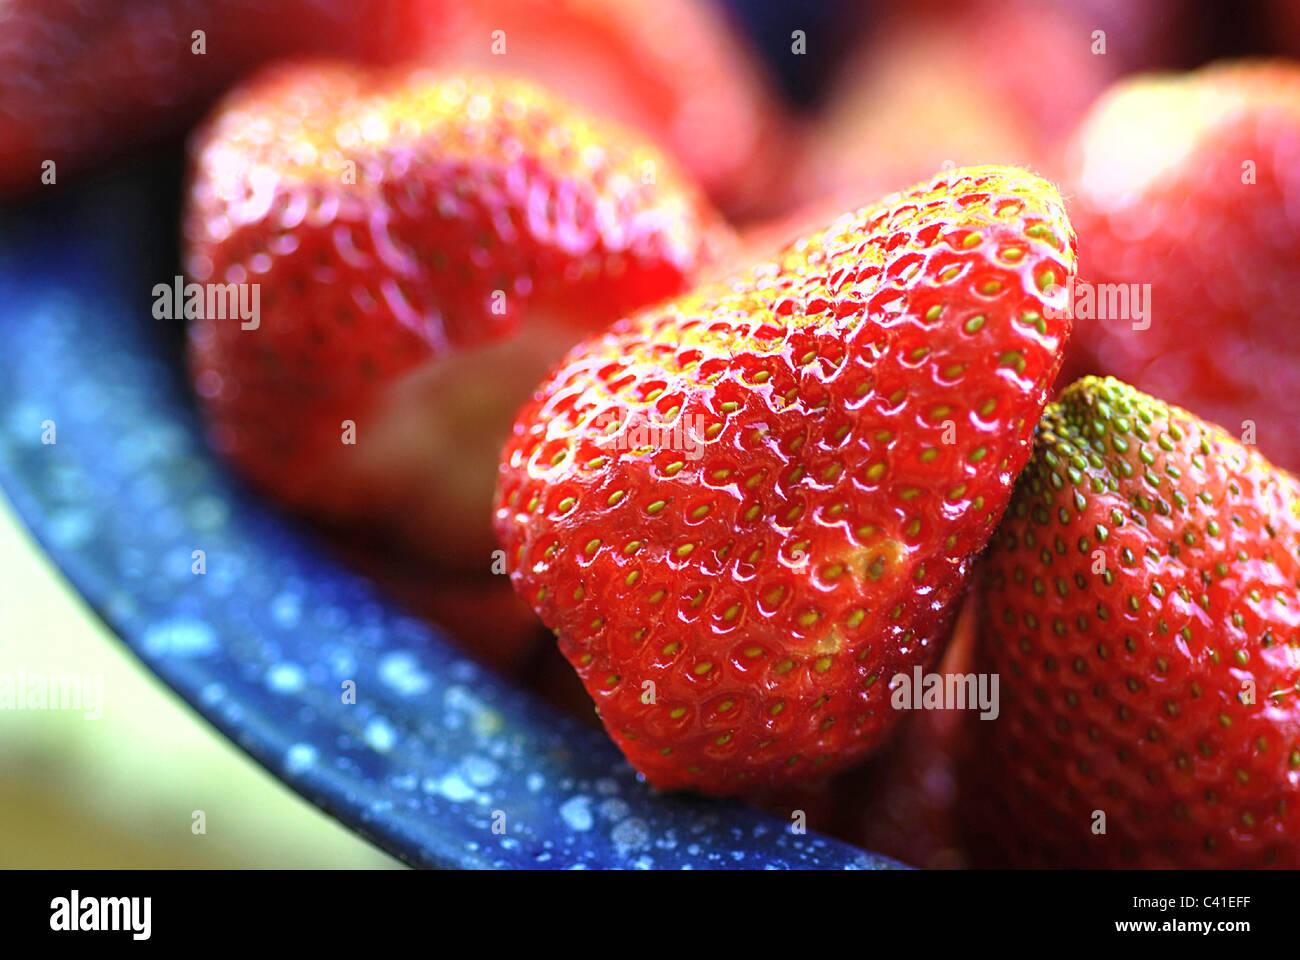 Fresh ripe strawberries in a vintage cobalt blue enamel colander Stock Photo